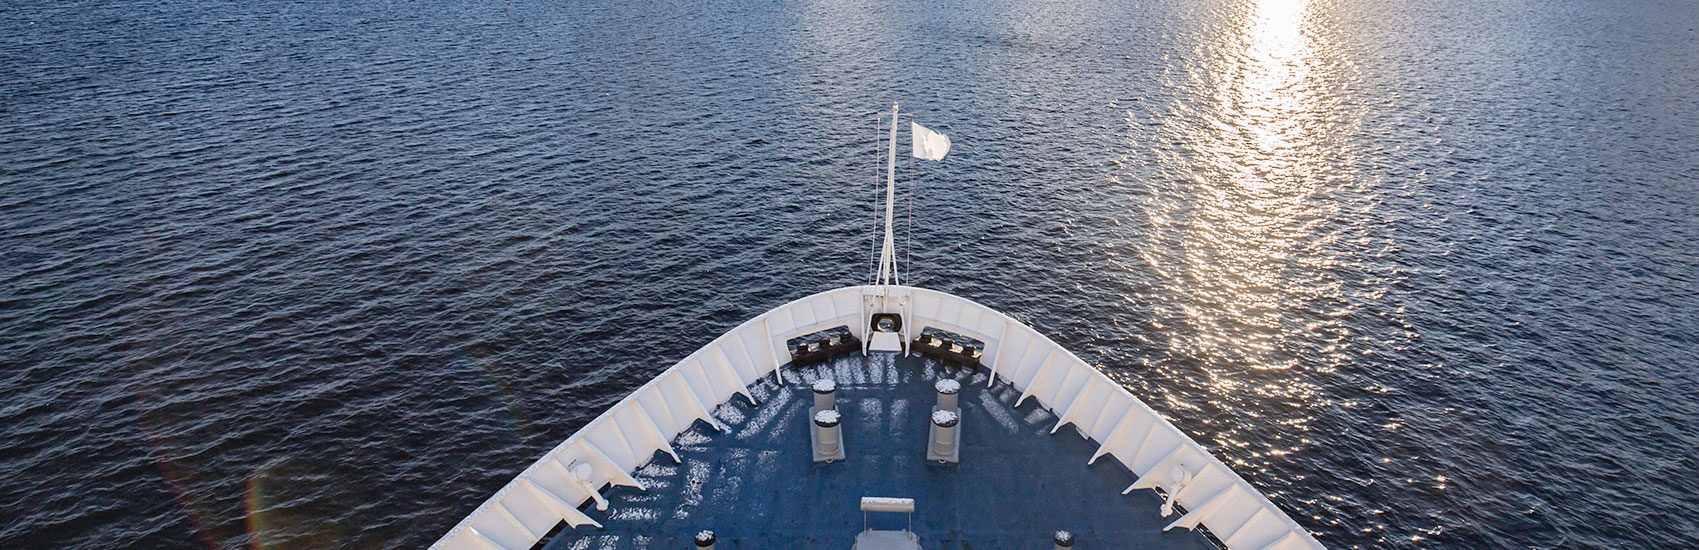 Savings to Antarctica with Intrepid Travel 1